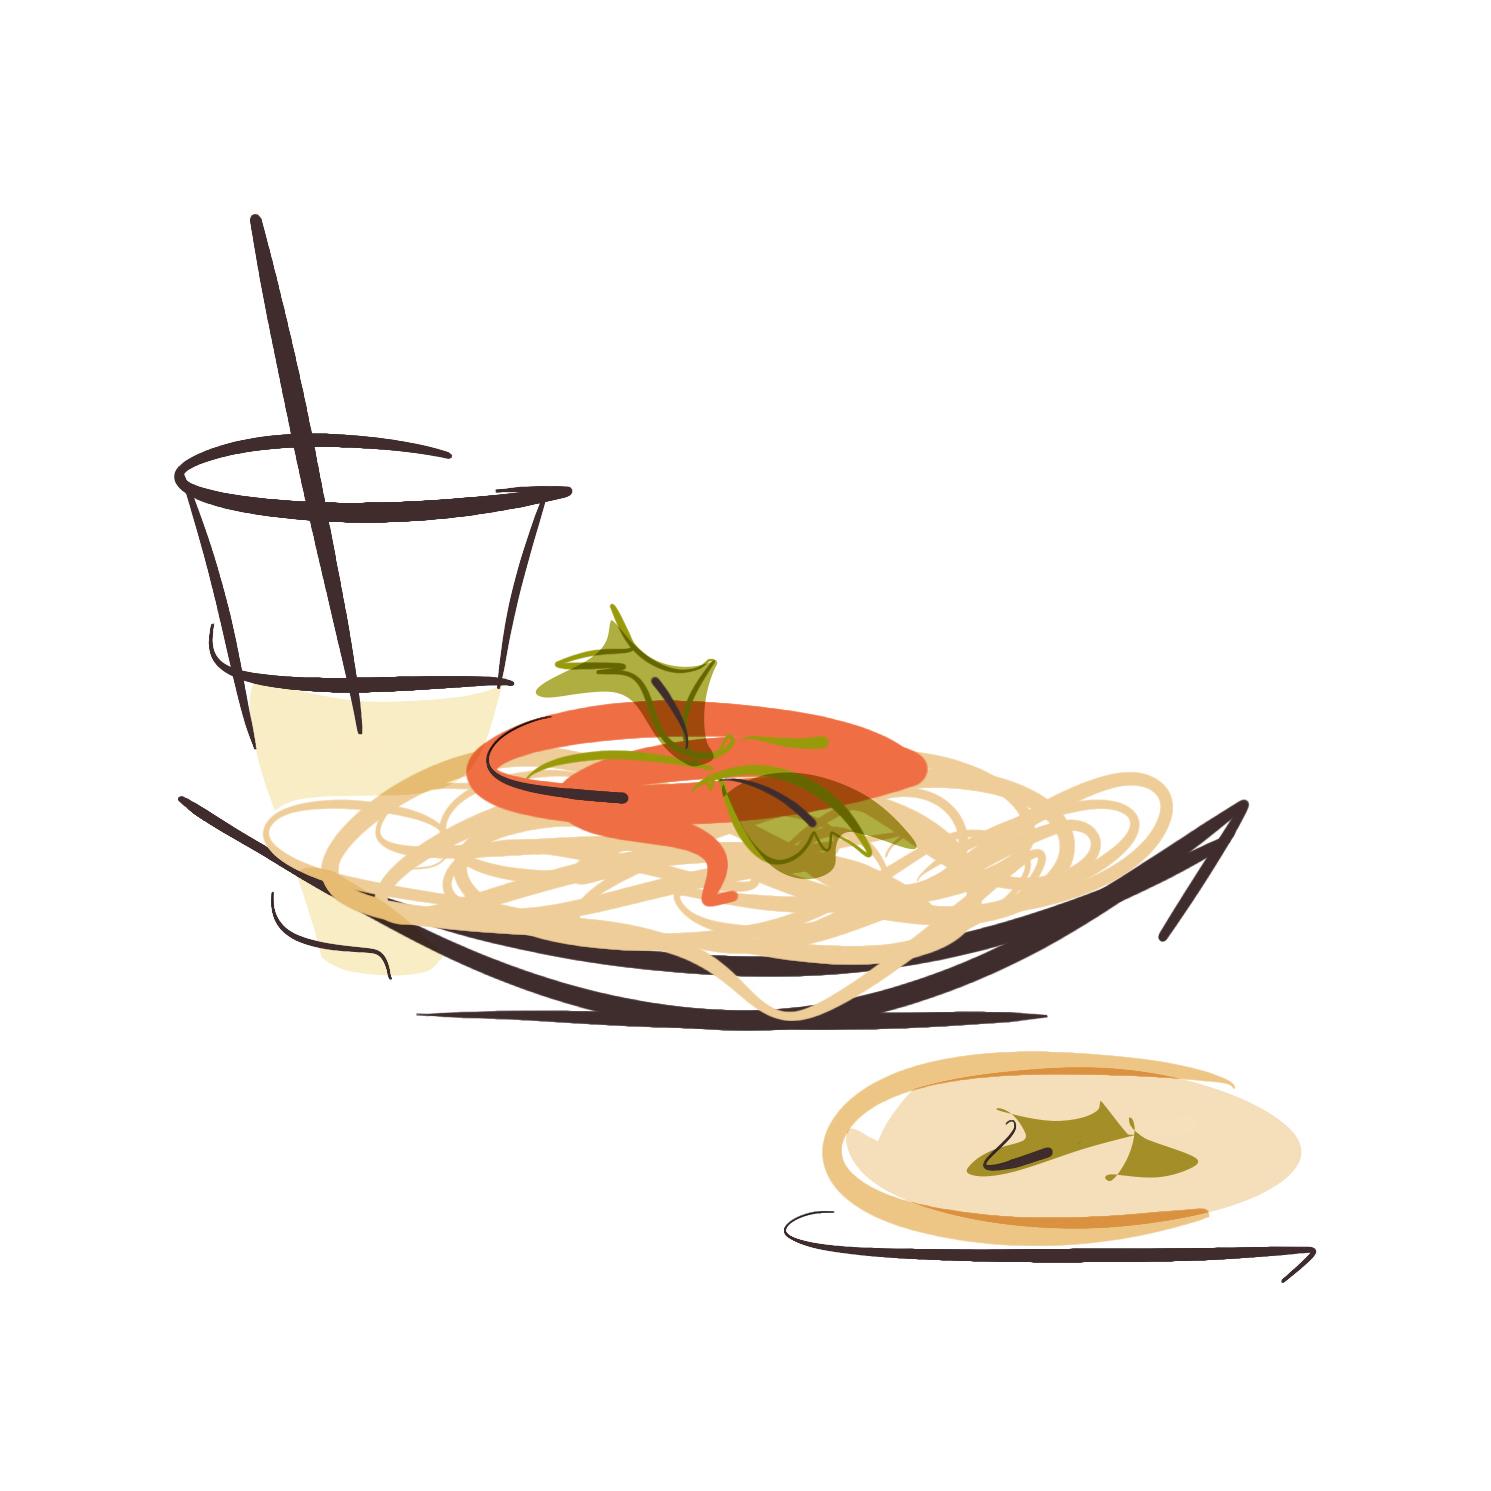 Spaghetti Illustration.jpg